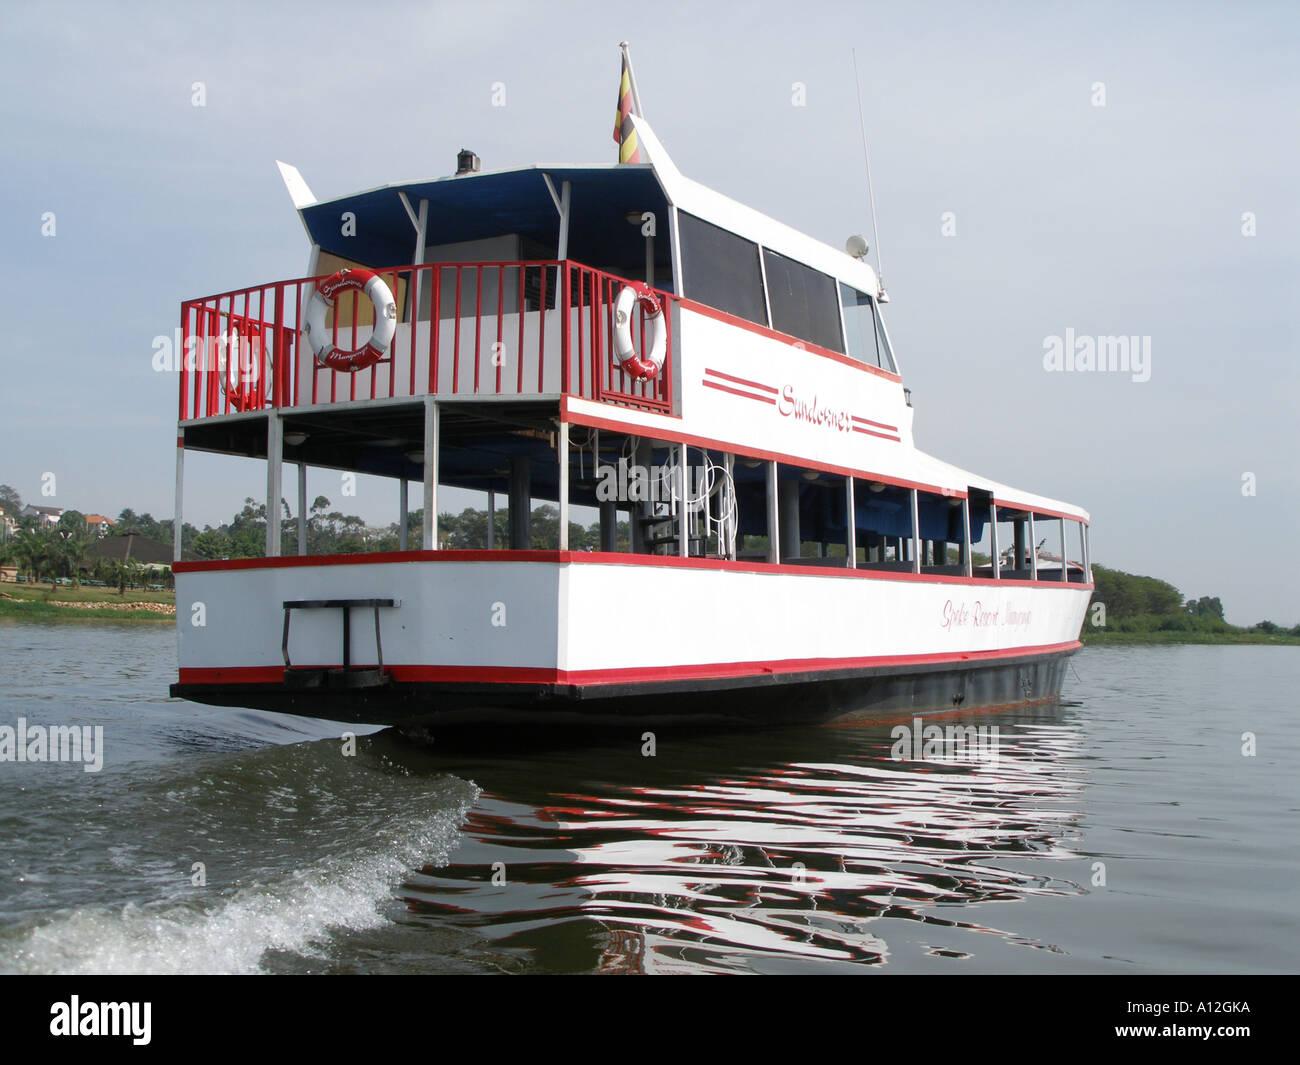 Tourist launch on Lake Victoria, Uganda - Stock Image